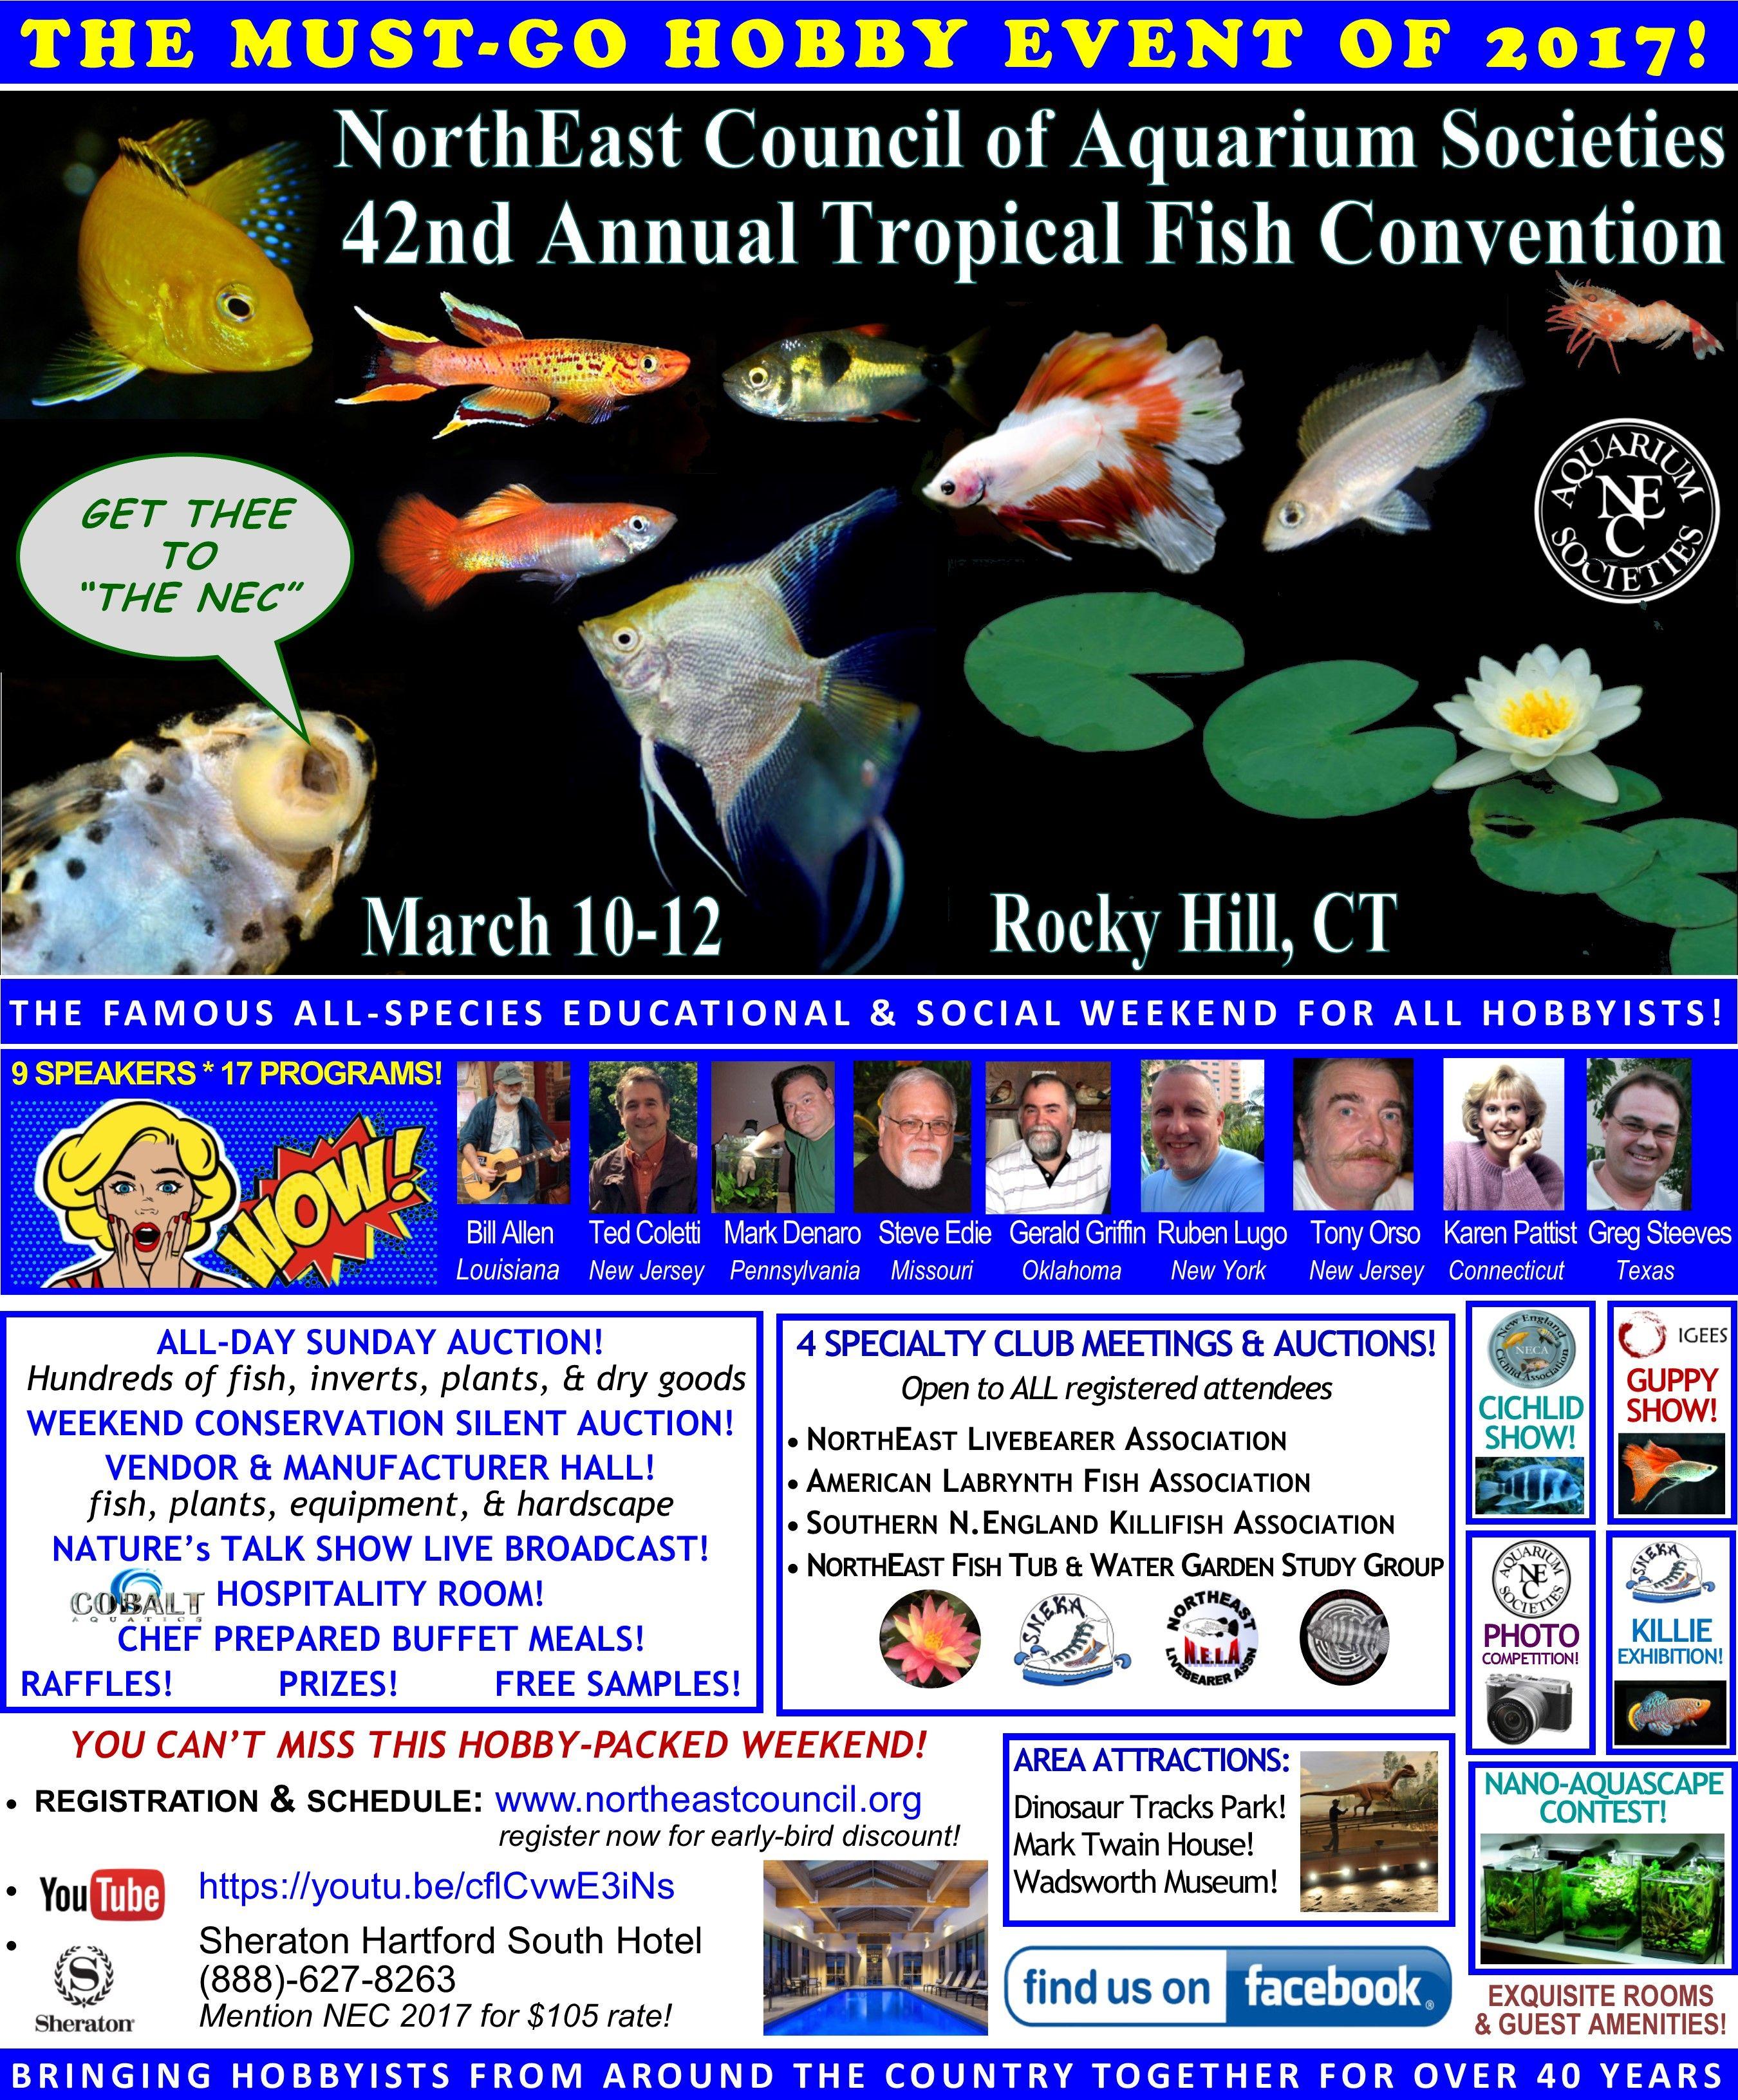 NEC 2017 Convention Flyer 1-17-2017.jpg